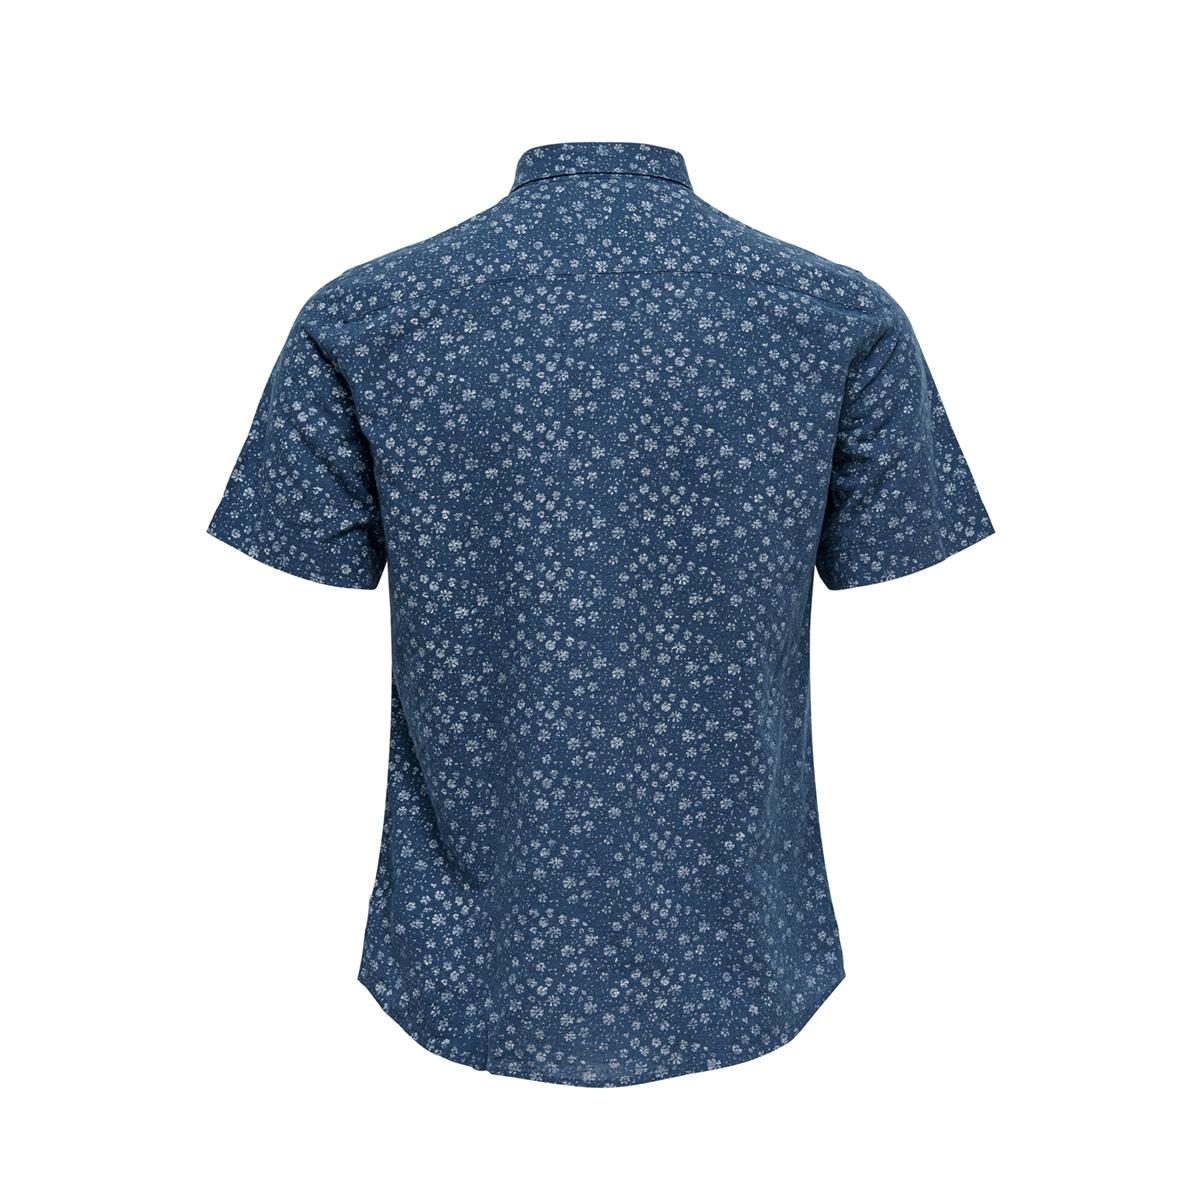 onscaiden ss aop linen shirt re 22012661 only & sons overhemd majolica blue